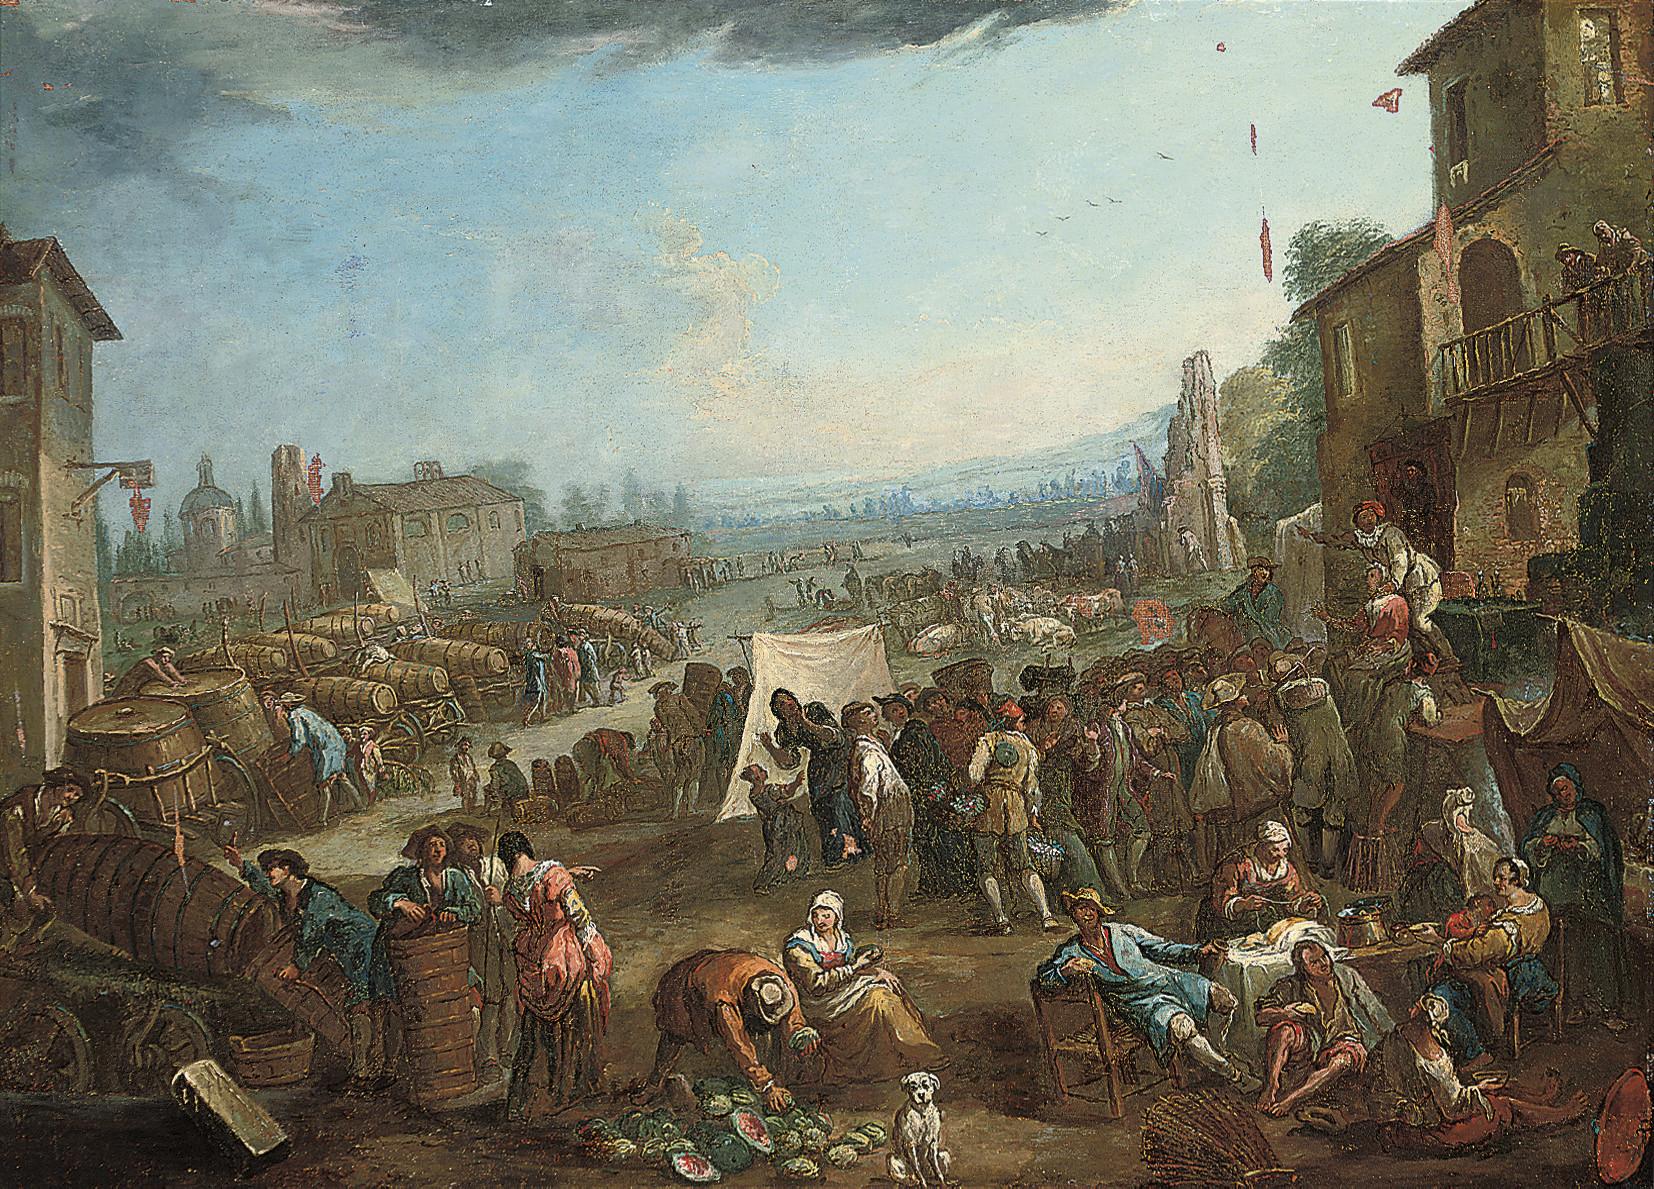 A market in a town, a landscape beyond